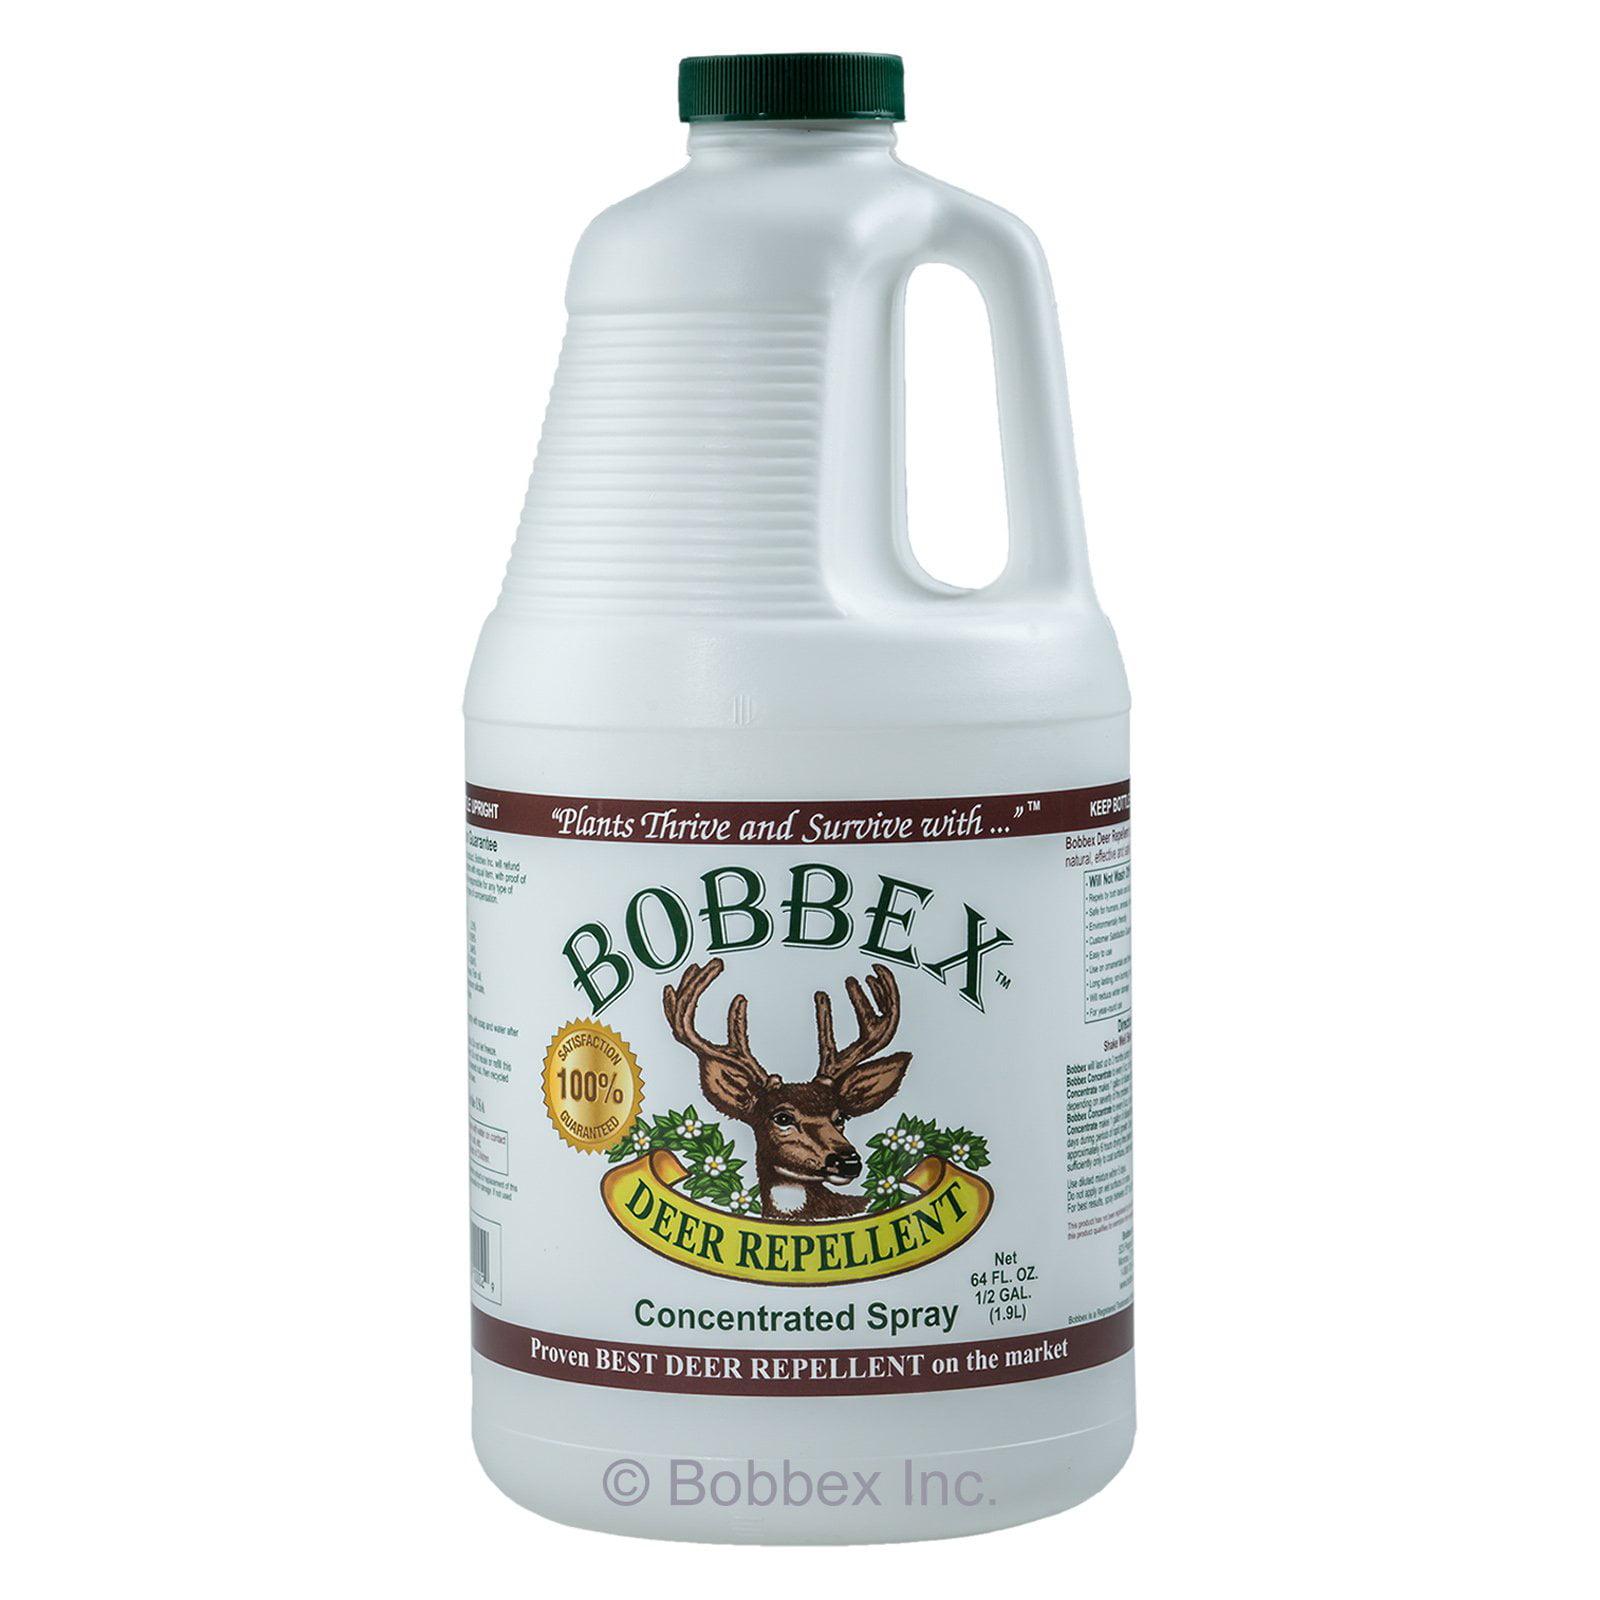 Bobbex Half Gallon Deer Repellent Concentrated Spray